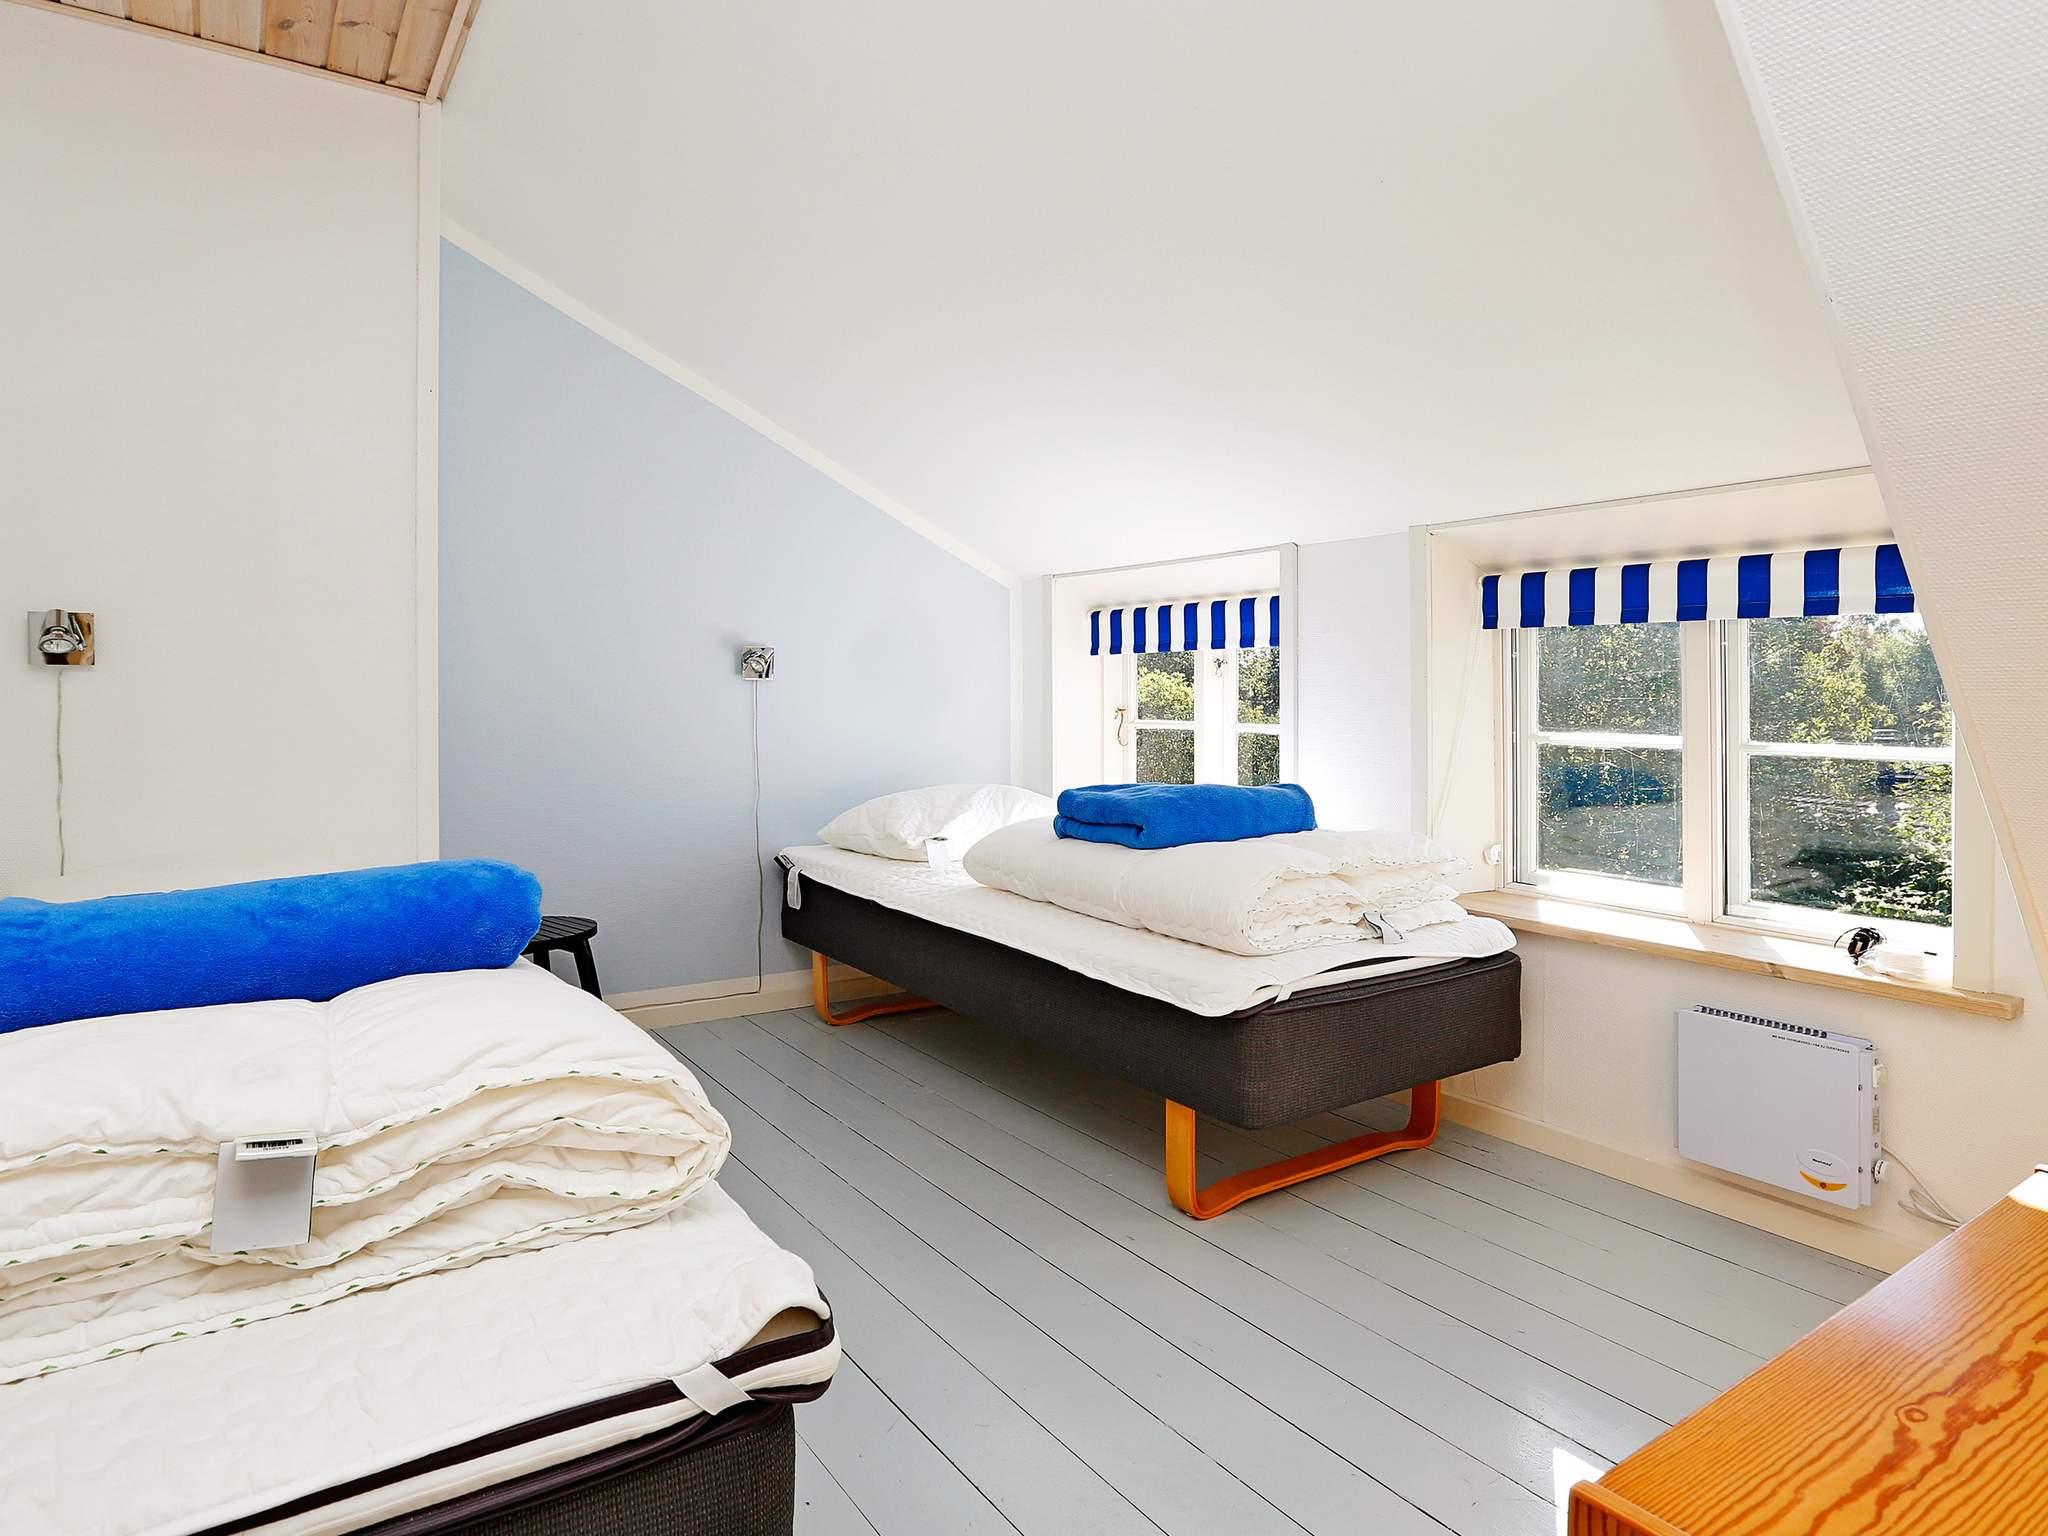 Ferienhaus Vejby Strand (771891), Vejby, , Nordseeland, Dänemark, Bild 17